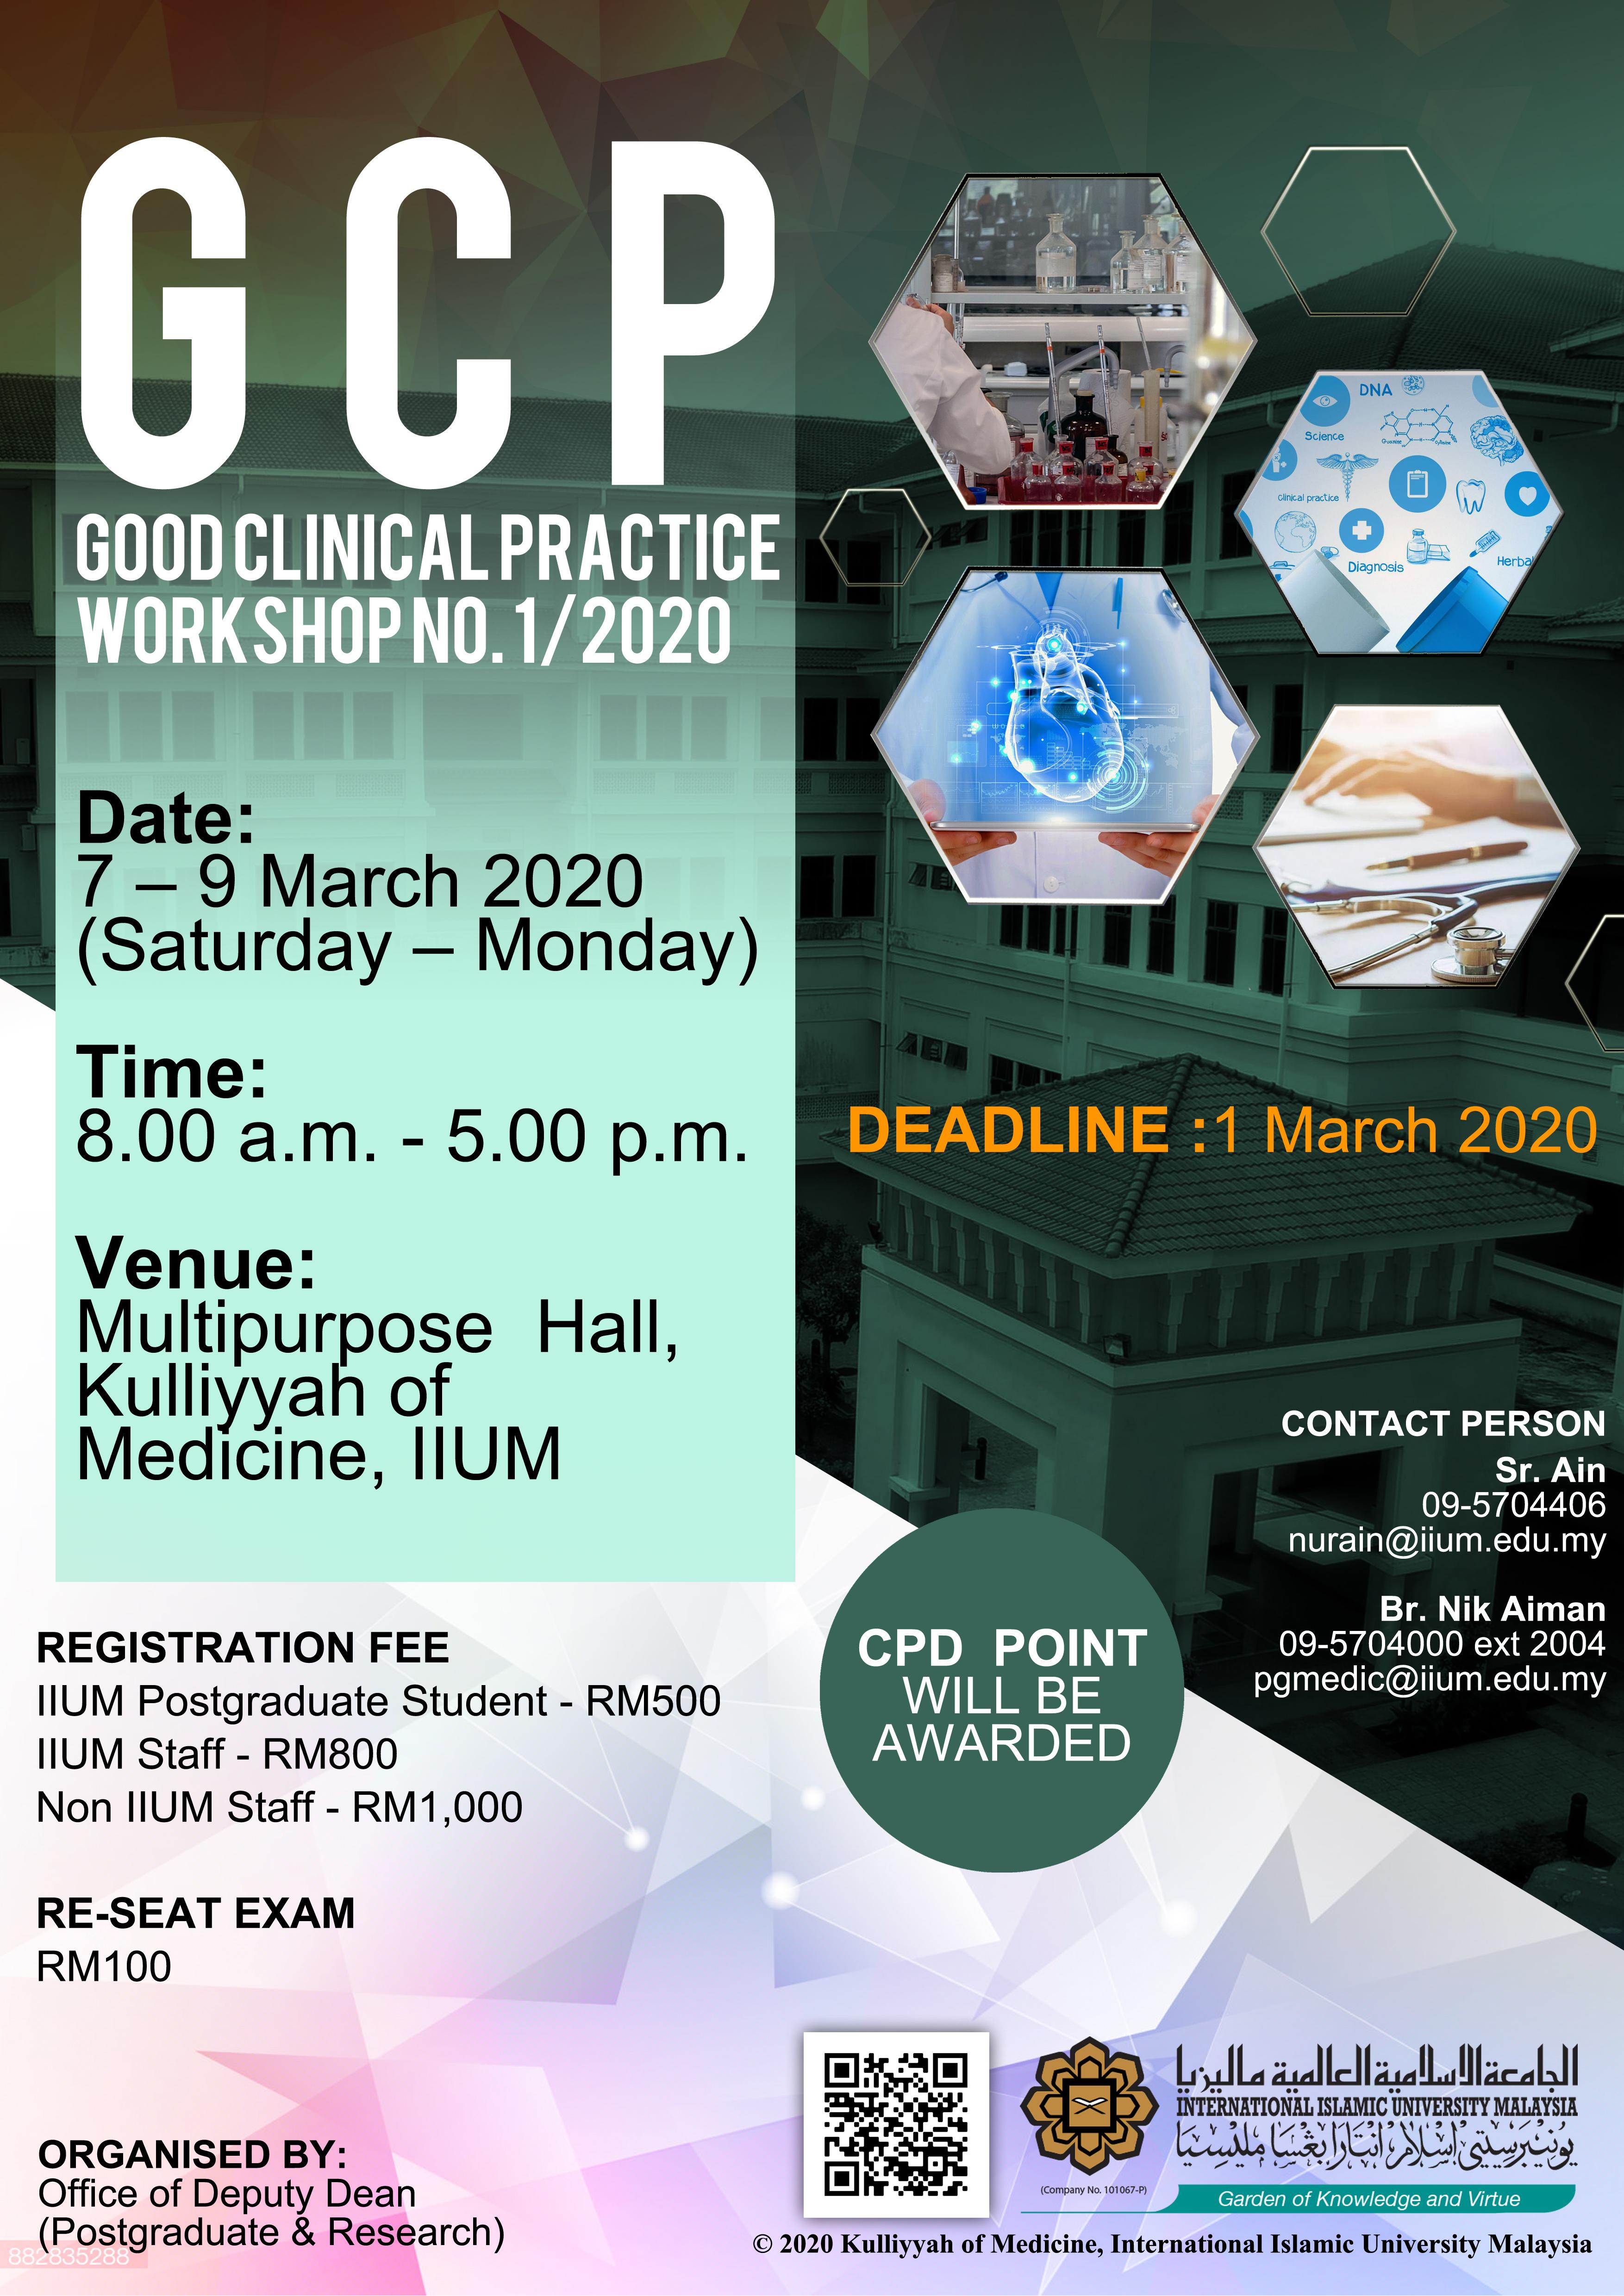 Good Clinical Practice Workshop No. 1/2020